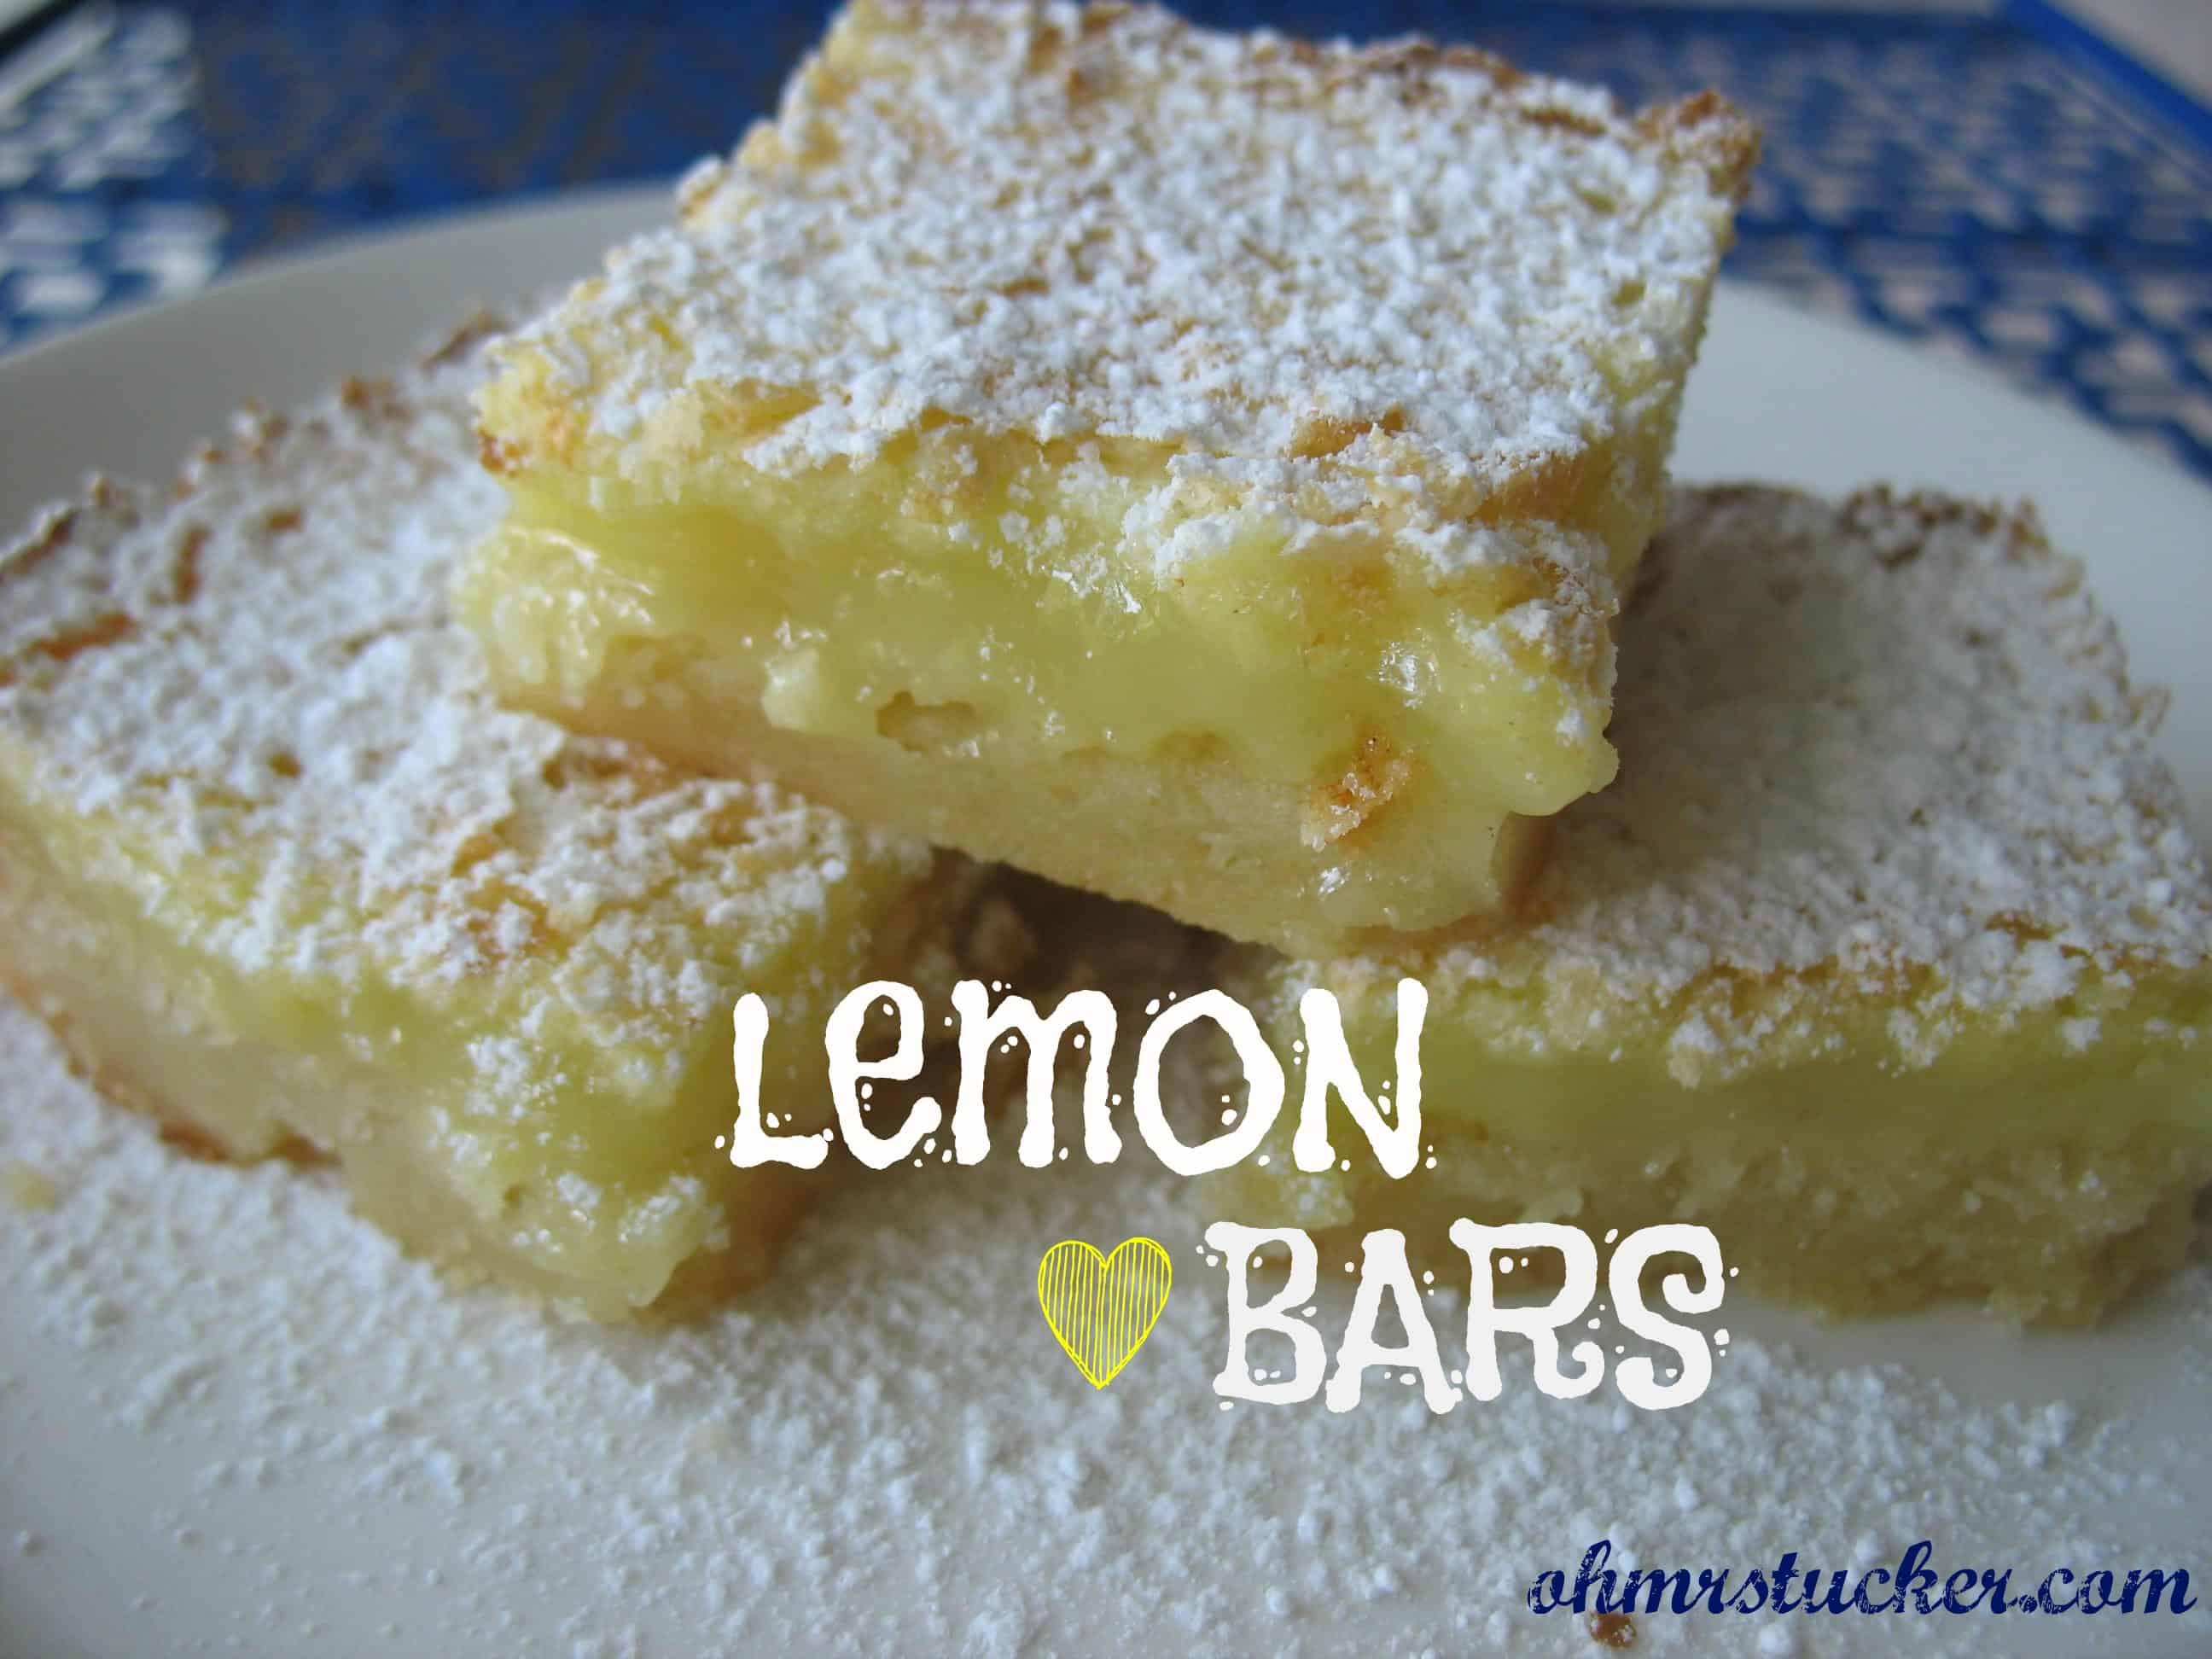 Fresh, crisp, perfect for your non-chocolate lovers: Paula Deen's Lemon Bars #lemonbars #pauladeen #desserts #ohmrstucker